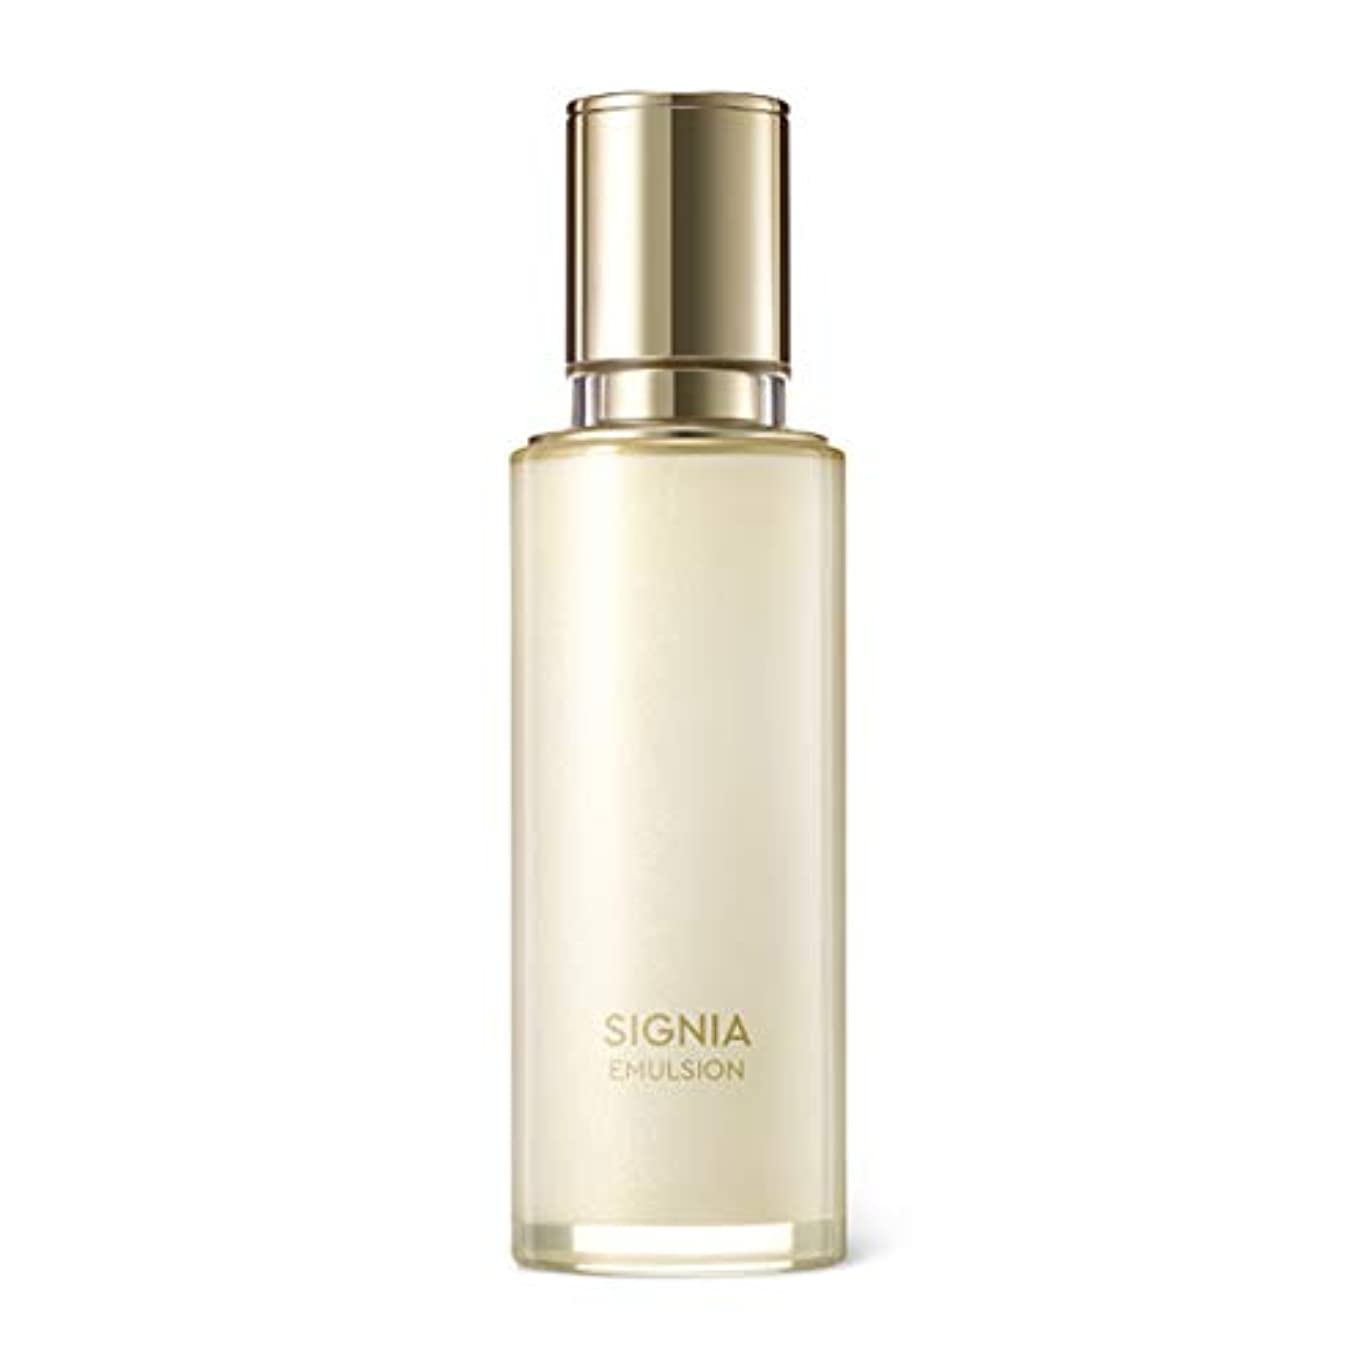 【HERA ヘラ】 シグニアエマルジョン 150ml Signia Emulsion/海外直配送 [並行輸入品] [ShopMaster]